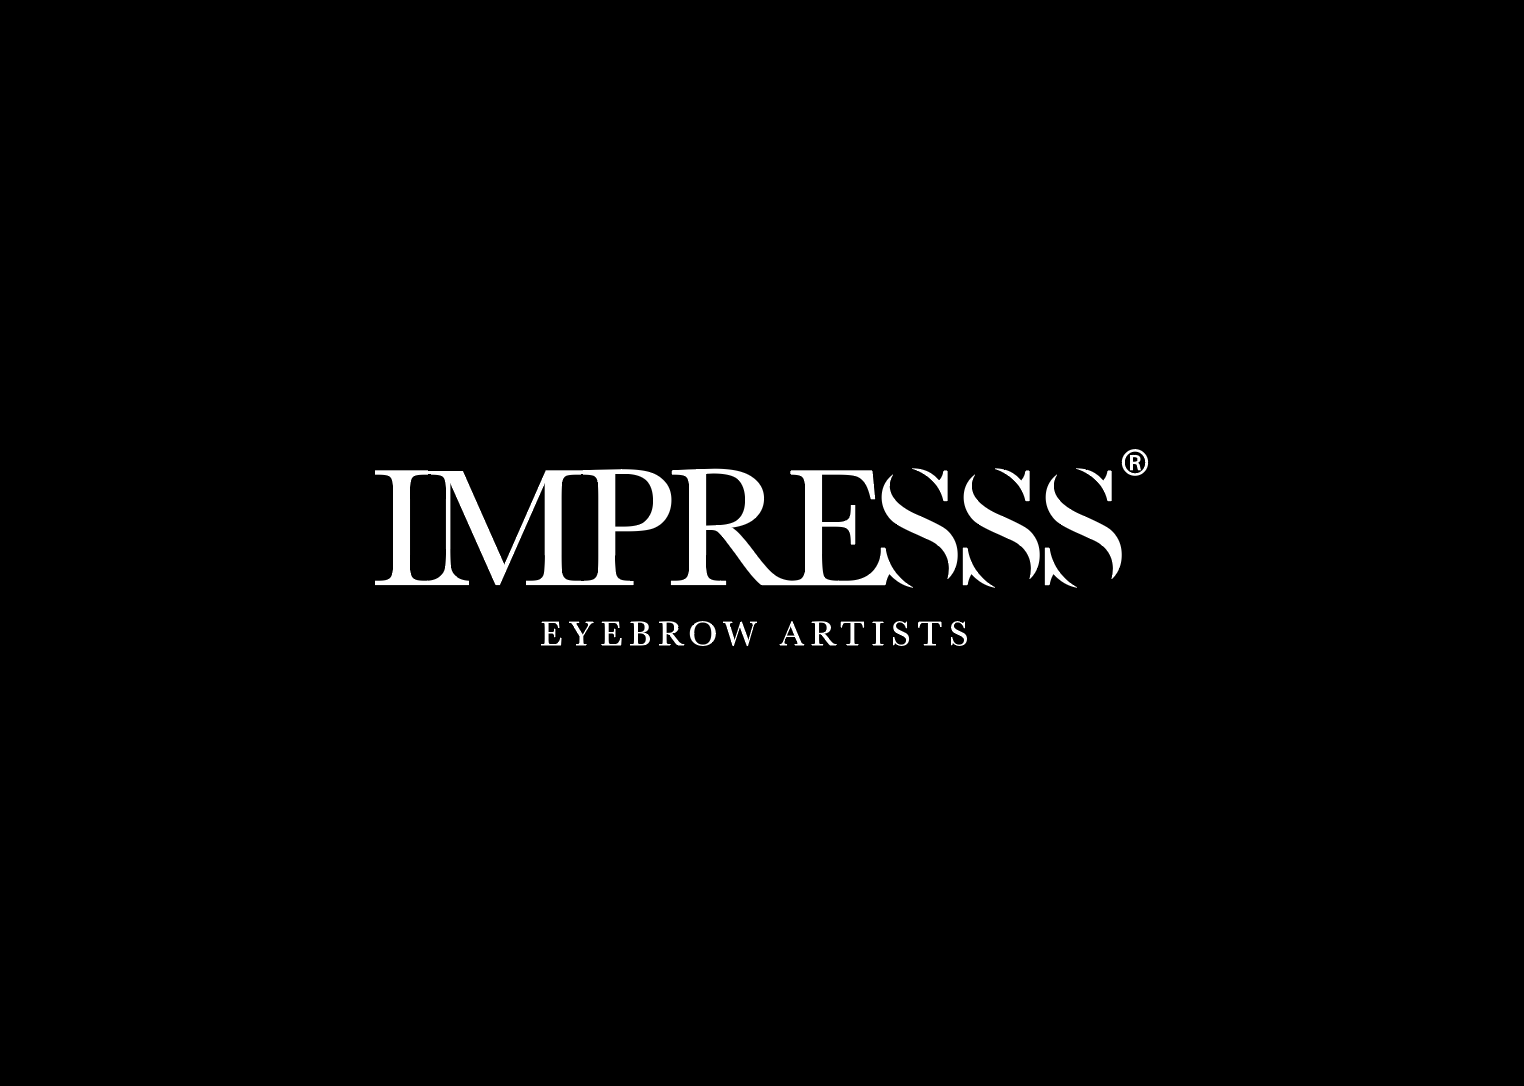 IMPRESSS